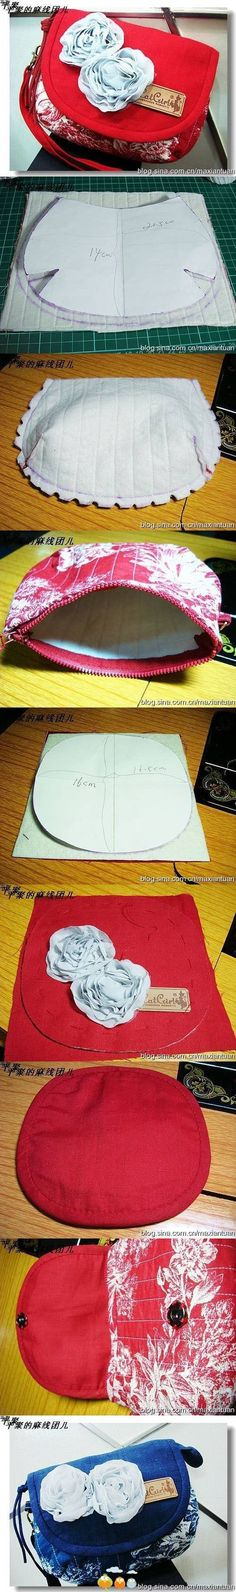 How to Make Stylish Fabric Handmade bags - Simple Craft Ideas Diy Handbag, Diy Purse, Handbag Tutorial, Purse Patterns, Sewing Patterns, Sacs Tote Bags, Diy Sac, Craft Bags, Mini Handbags